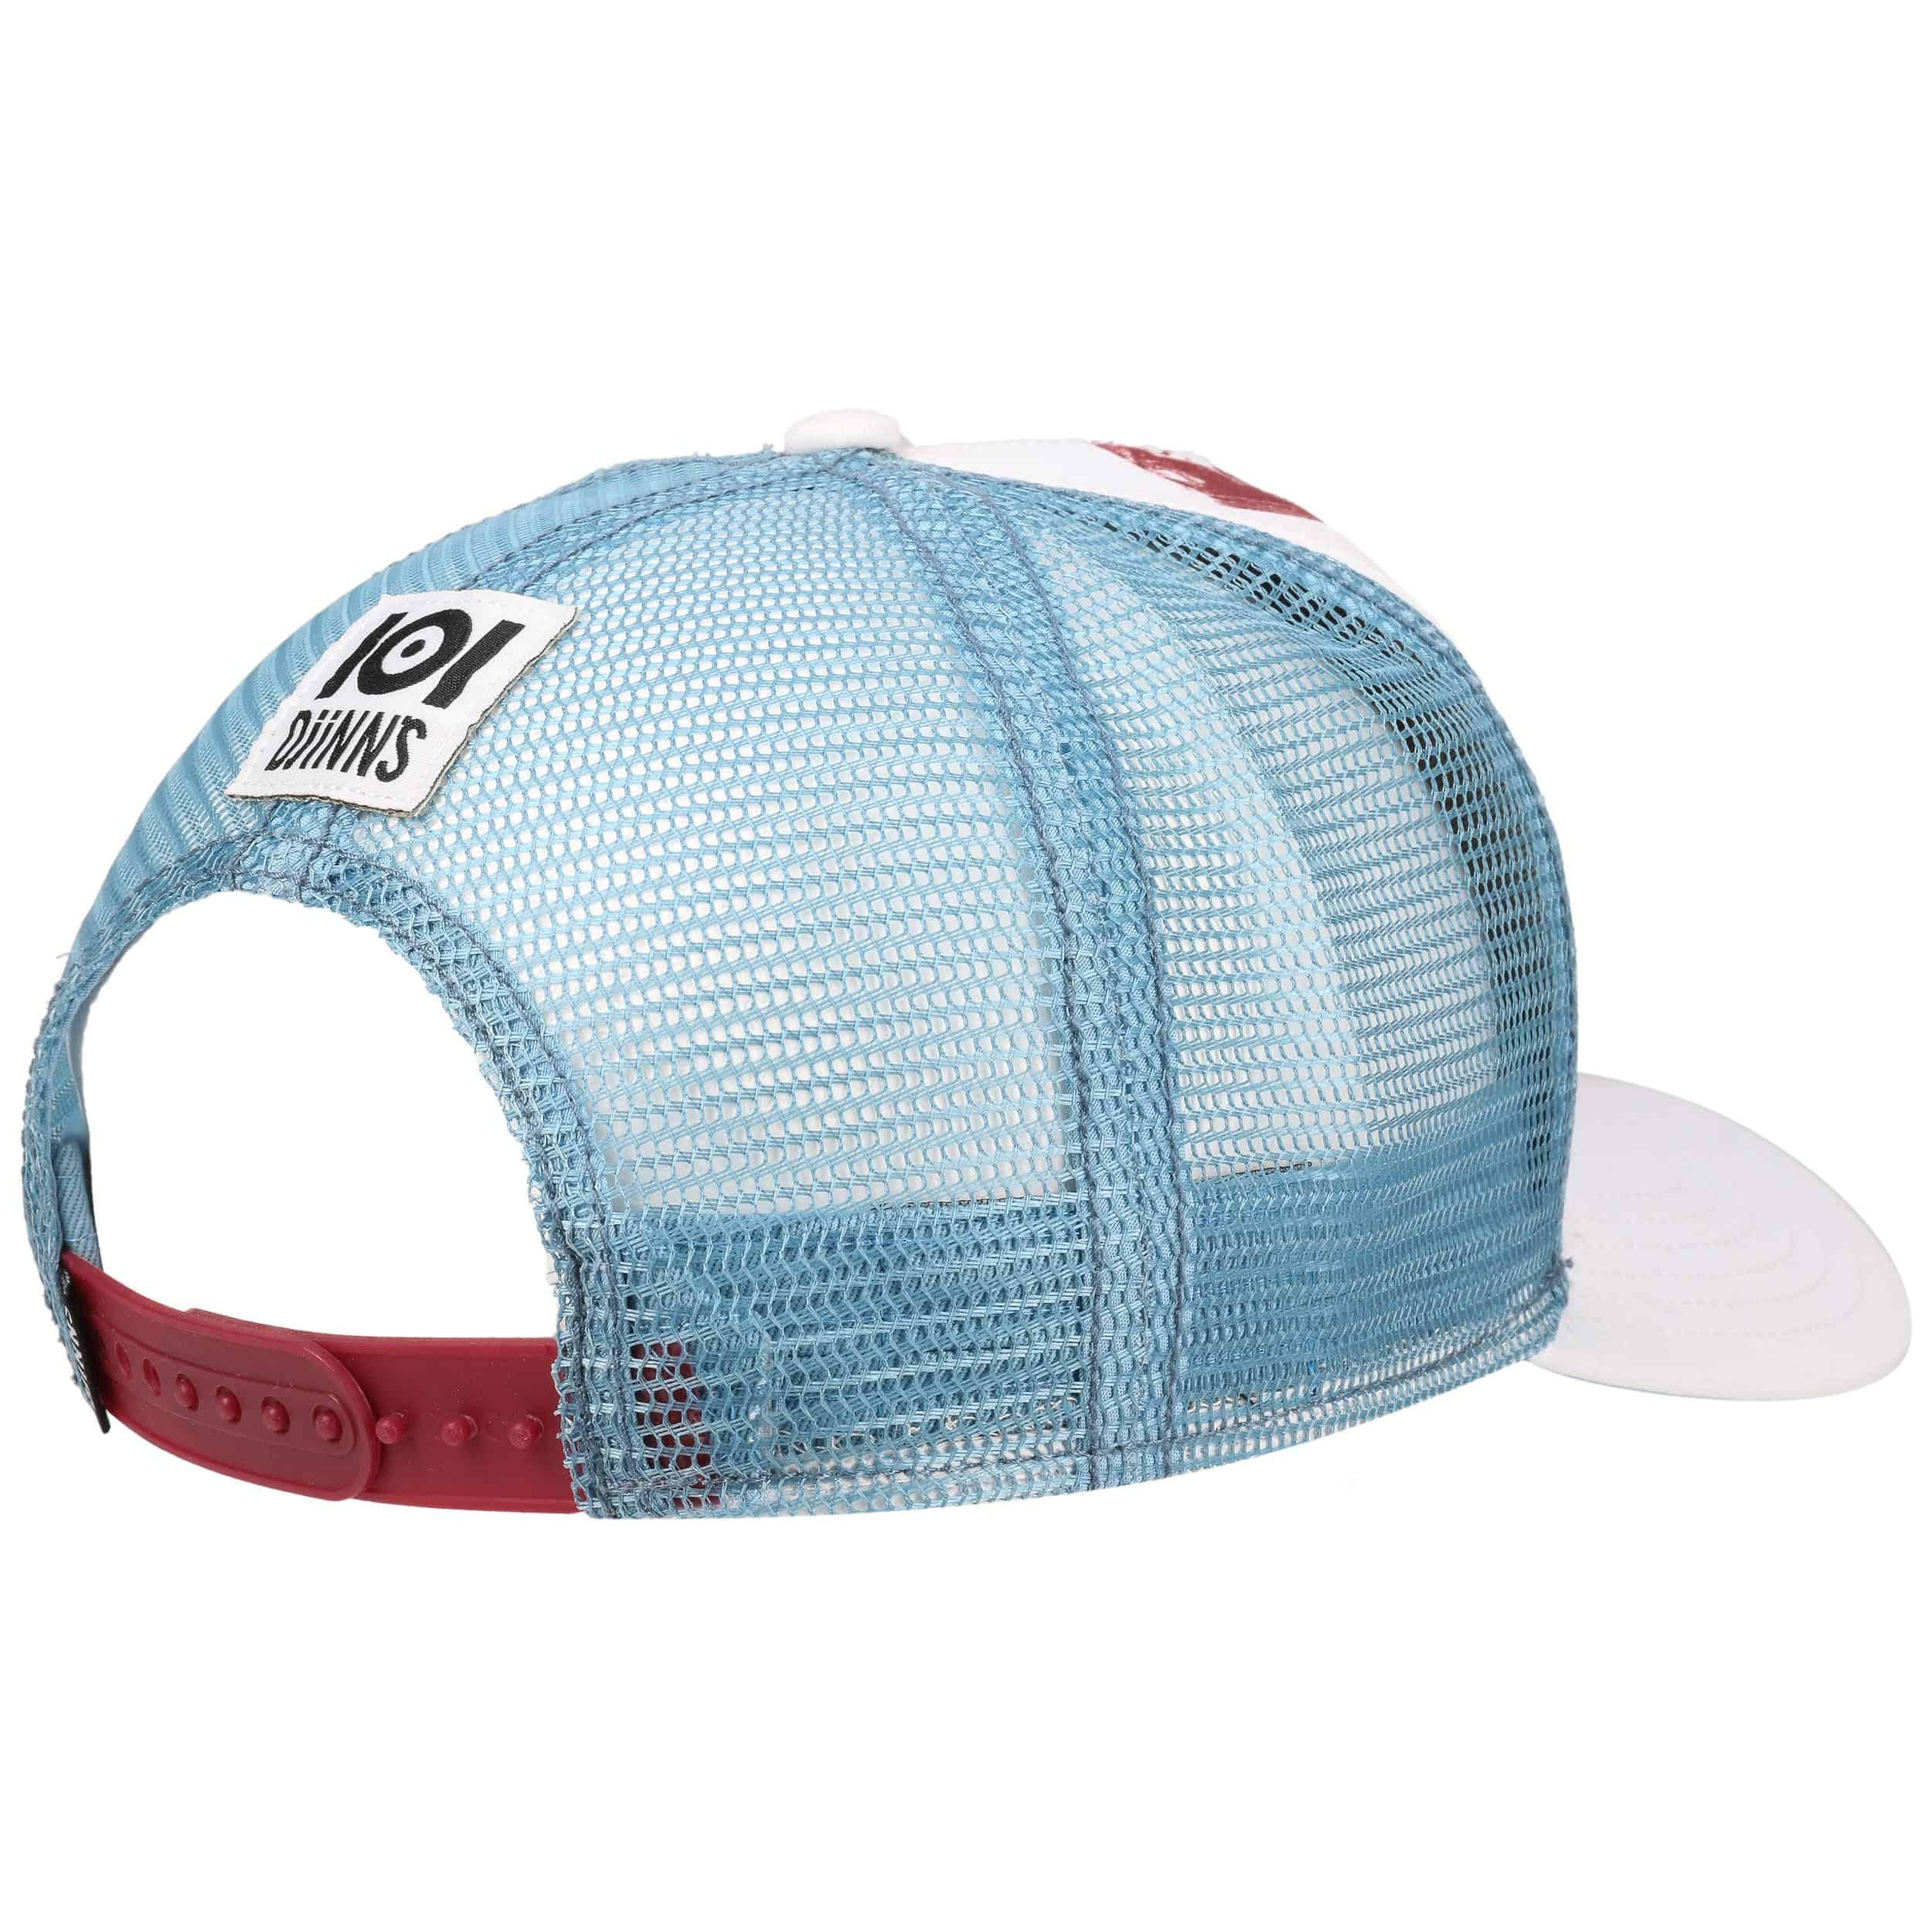 saturn hft 101 trucker cap by djinns gbp 22 95 hats. Black Bedroom Furniture Sets. Home Design Ideas